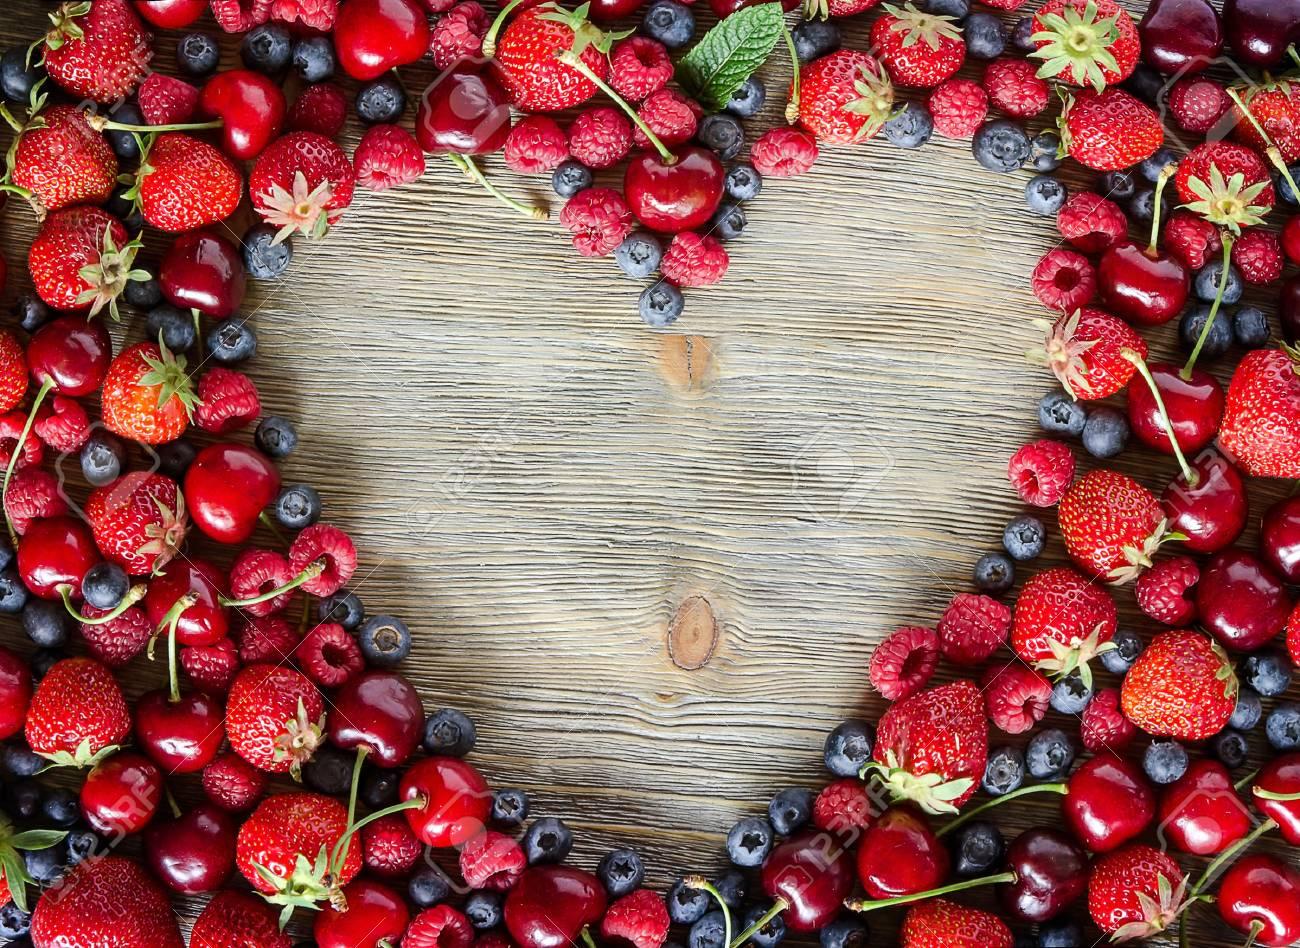 Fresh ripe berries, cherries, raspberries, blueberries copy space background, summer fruits, harvest concept, vitamins food, heart shaped - 41906003